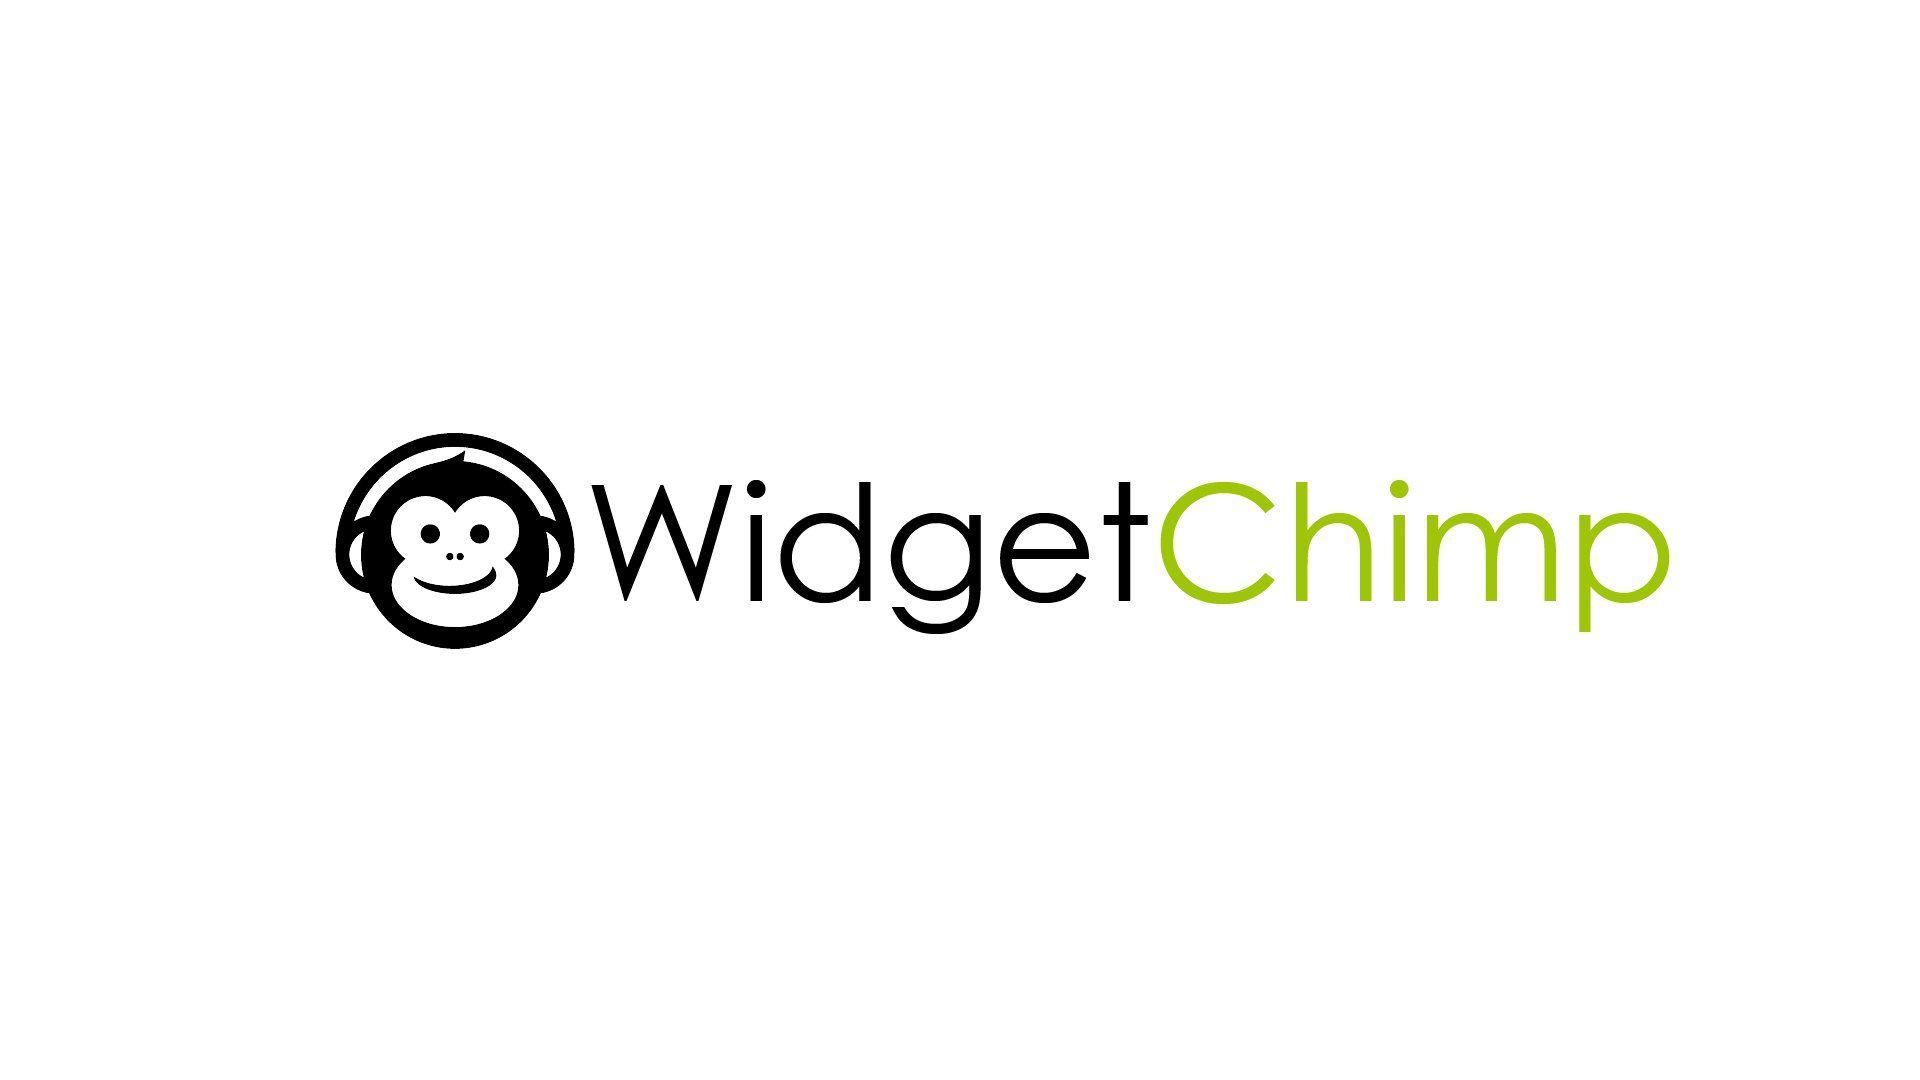 EBay Responsive Listing Template Builder WidgetChimpcom - Ebay template builder